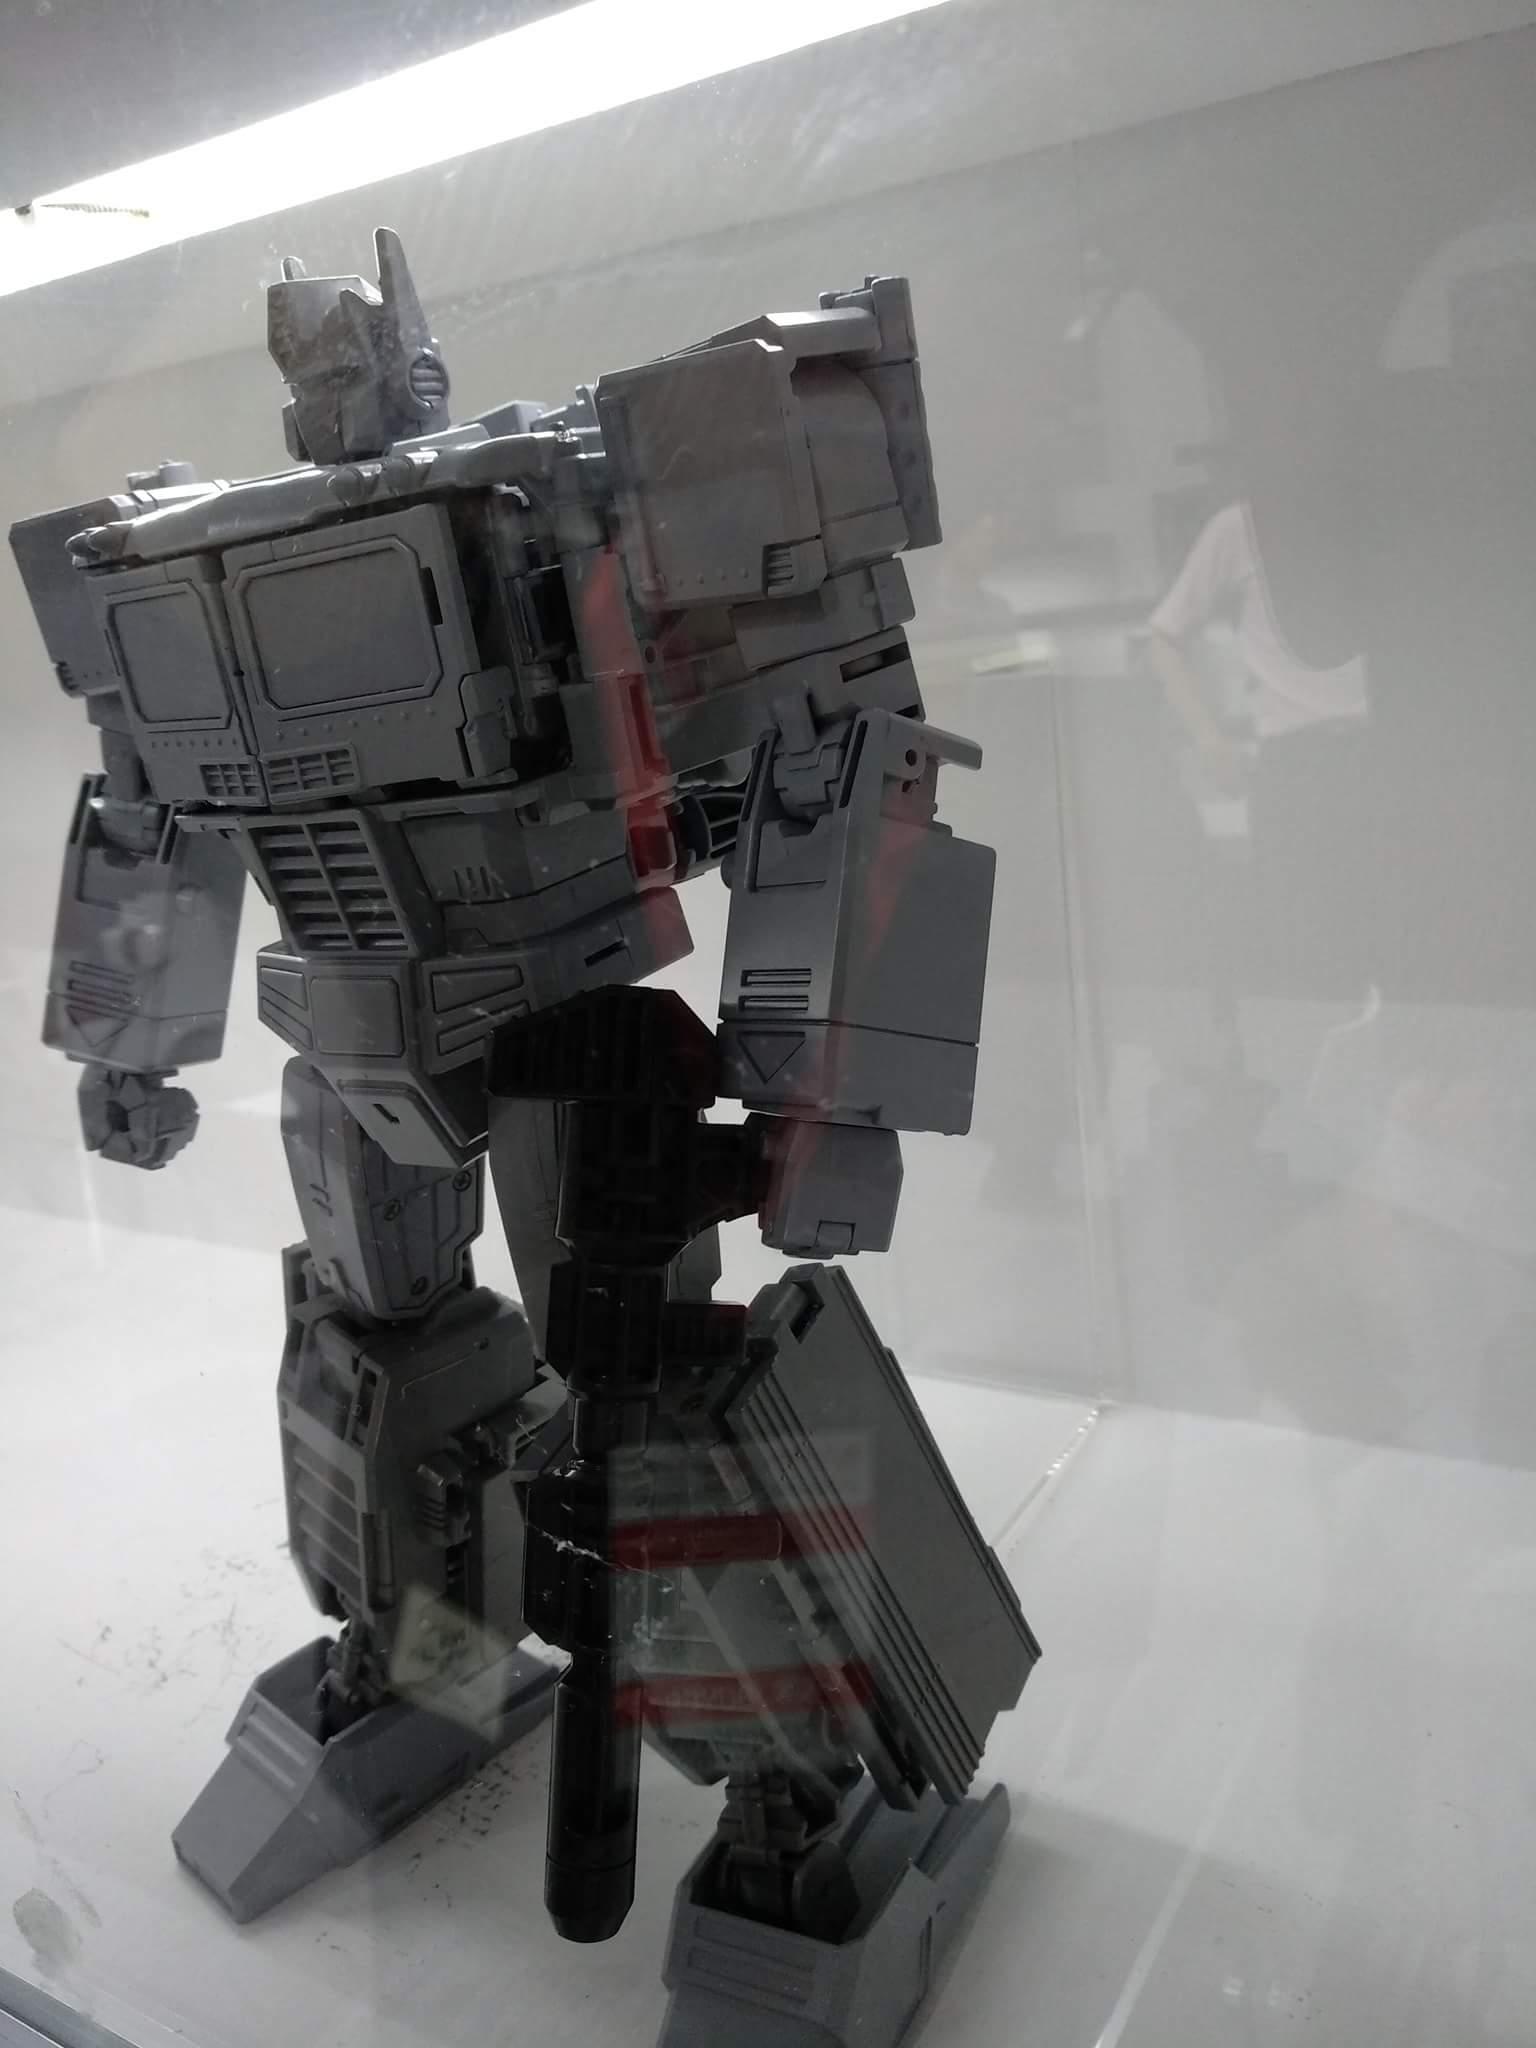 Masterpiece G1 - KO/Bootleg/Knockoff Transformers - Nouveautés, Questions, Réponses - Page 15 GBg6ACBT_o